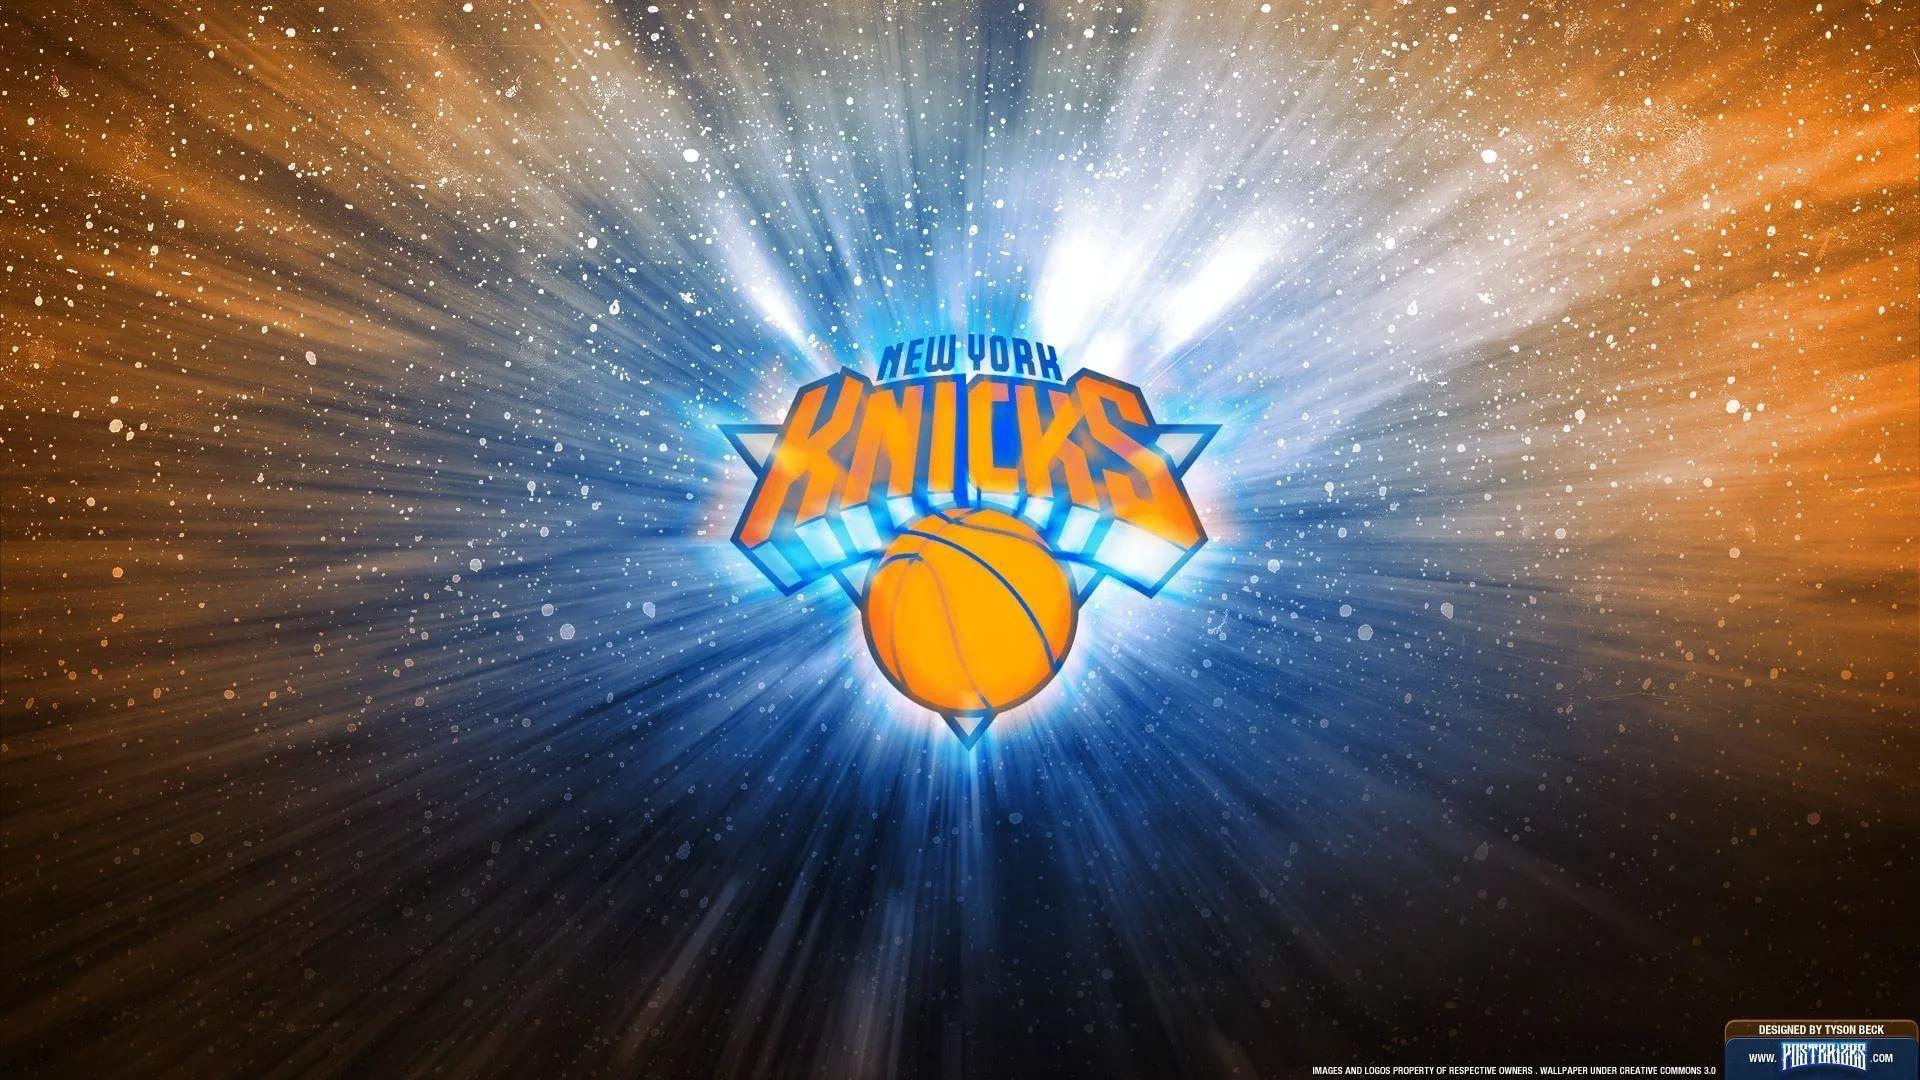 New York Knicks desktop wallpaper download